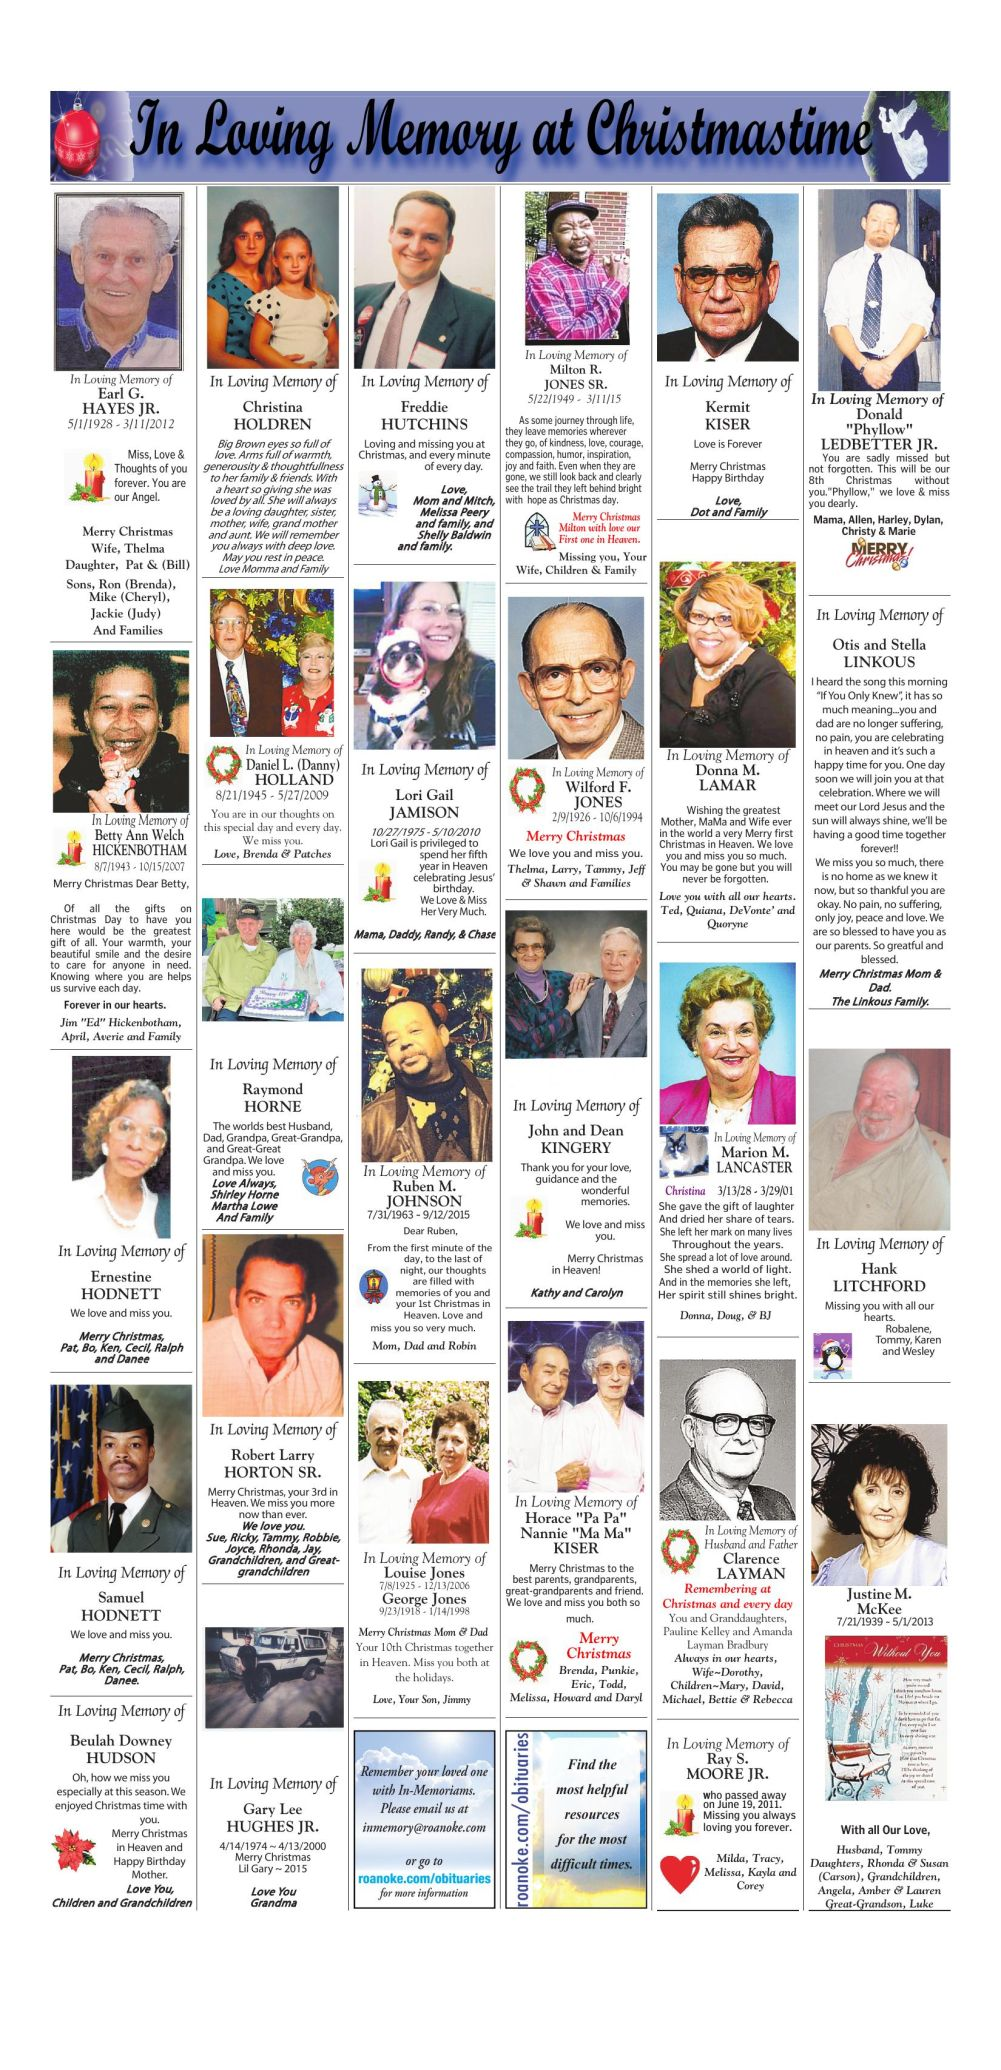 Christmas In Memory 2015 Page 3 | | roanoke.com